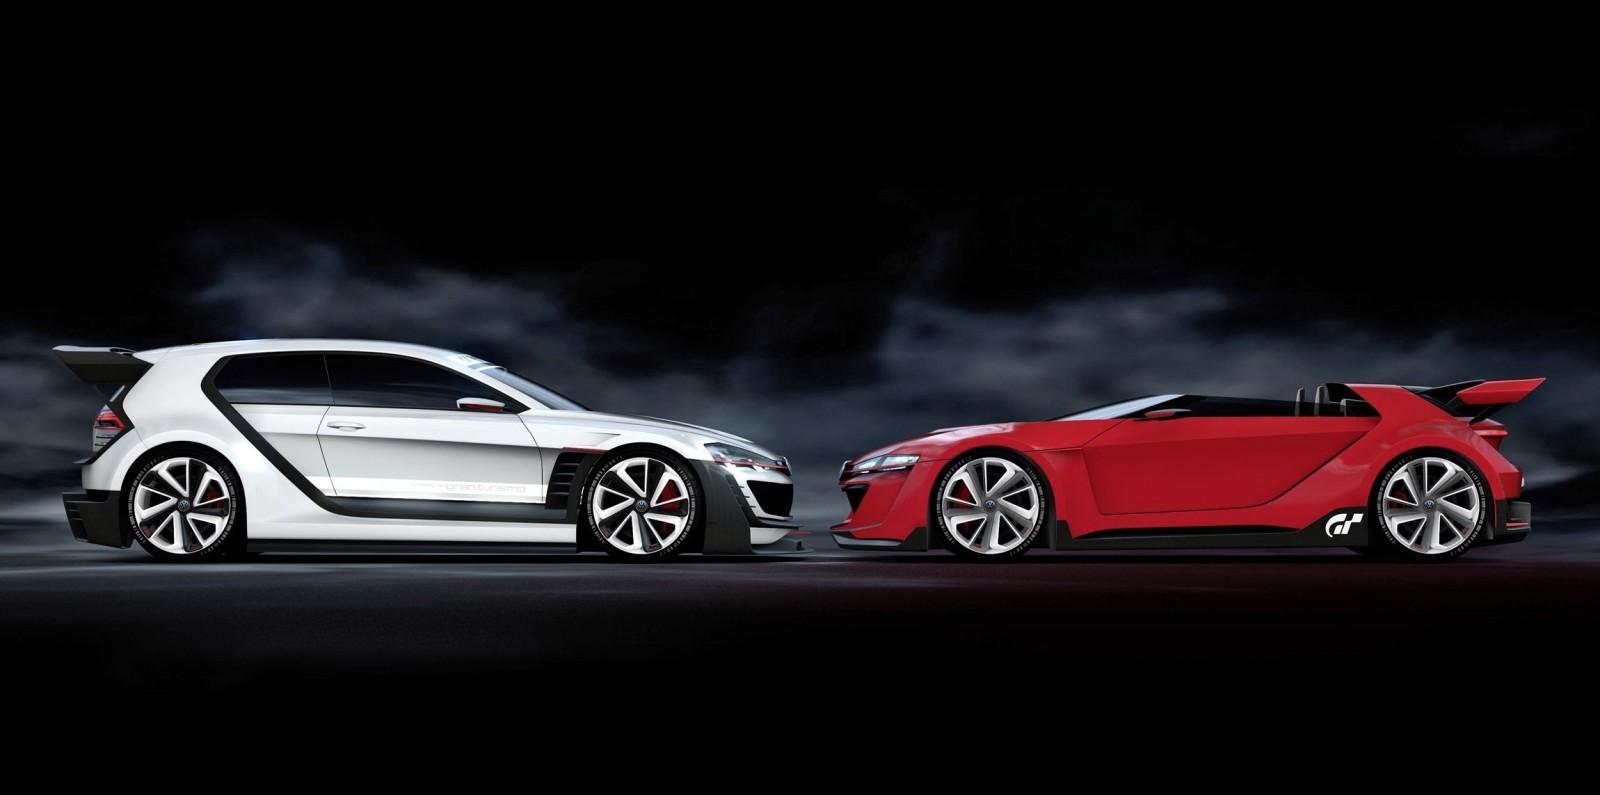 2015 Volkswagen GTI SuperSport 2